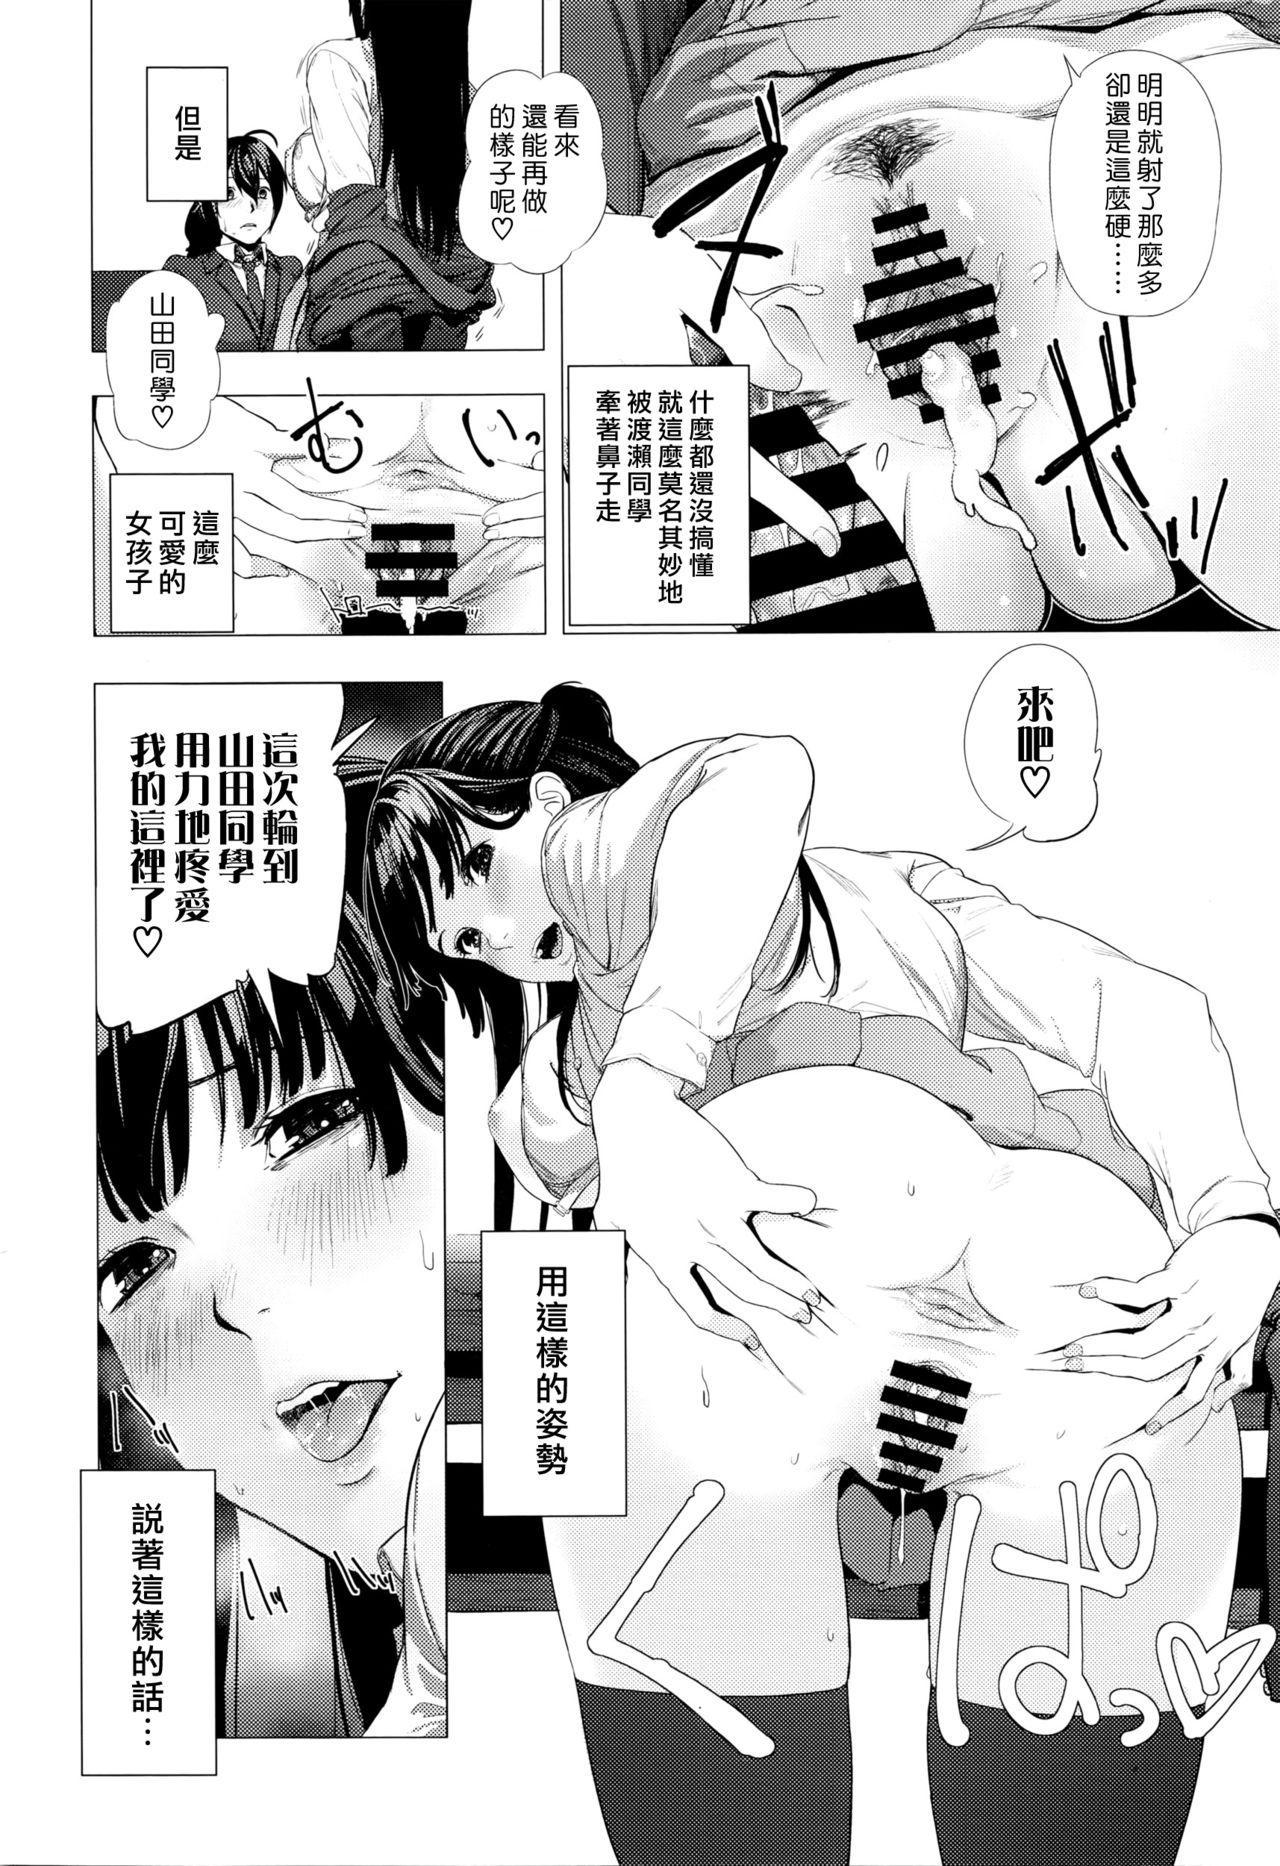 Gomenne ! Yamada-kun 13